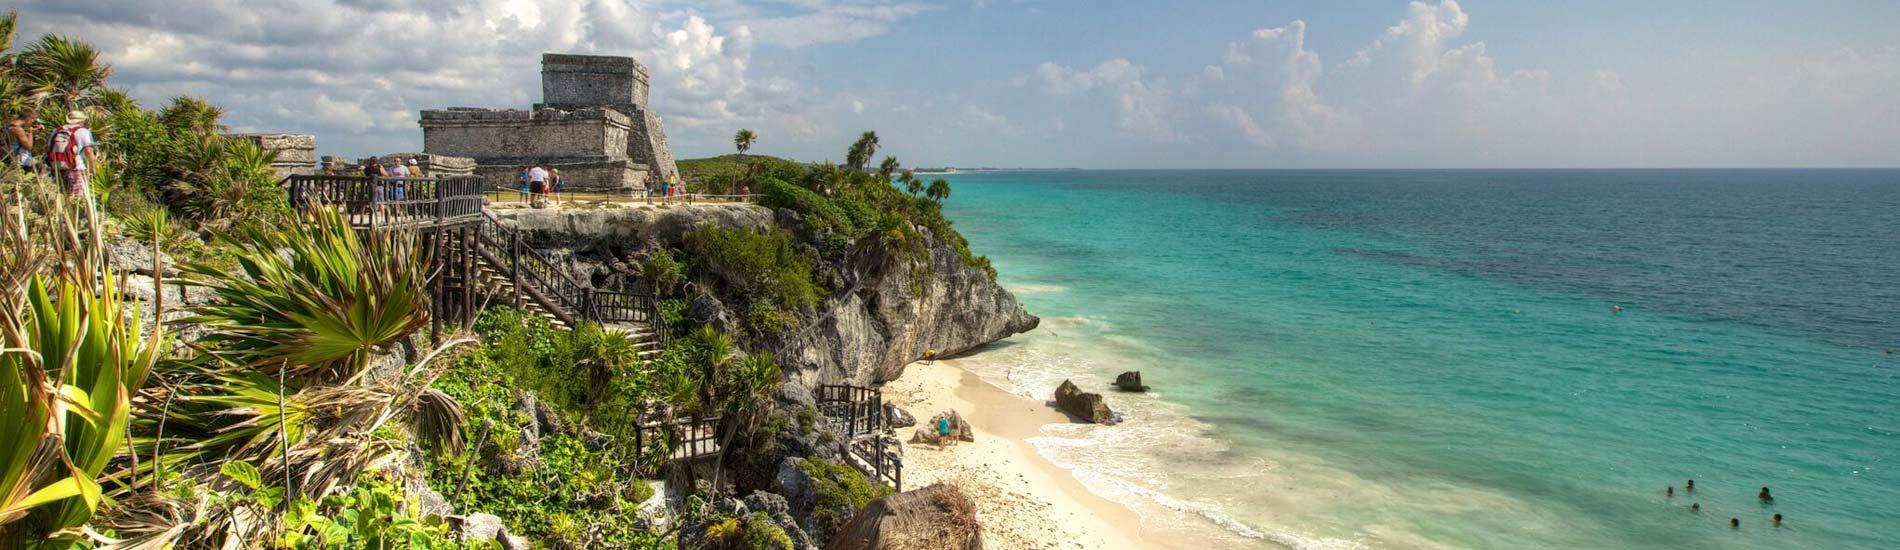 Experience Luxury Riviera Maya Tulum And Cancun Journey